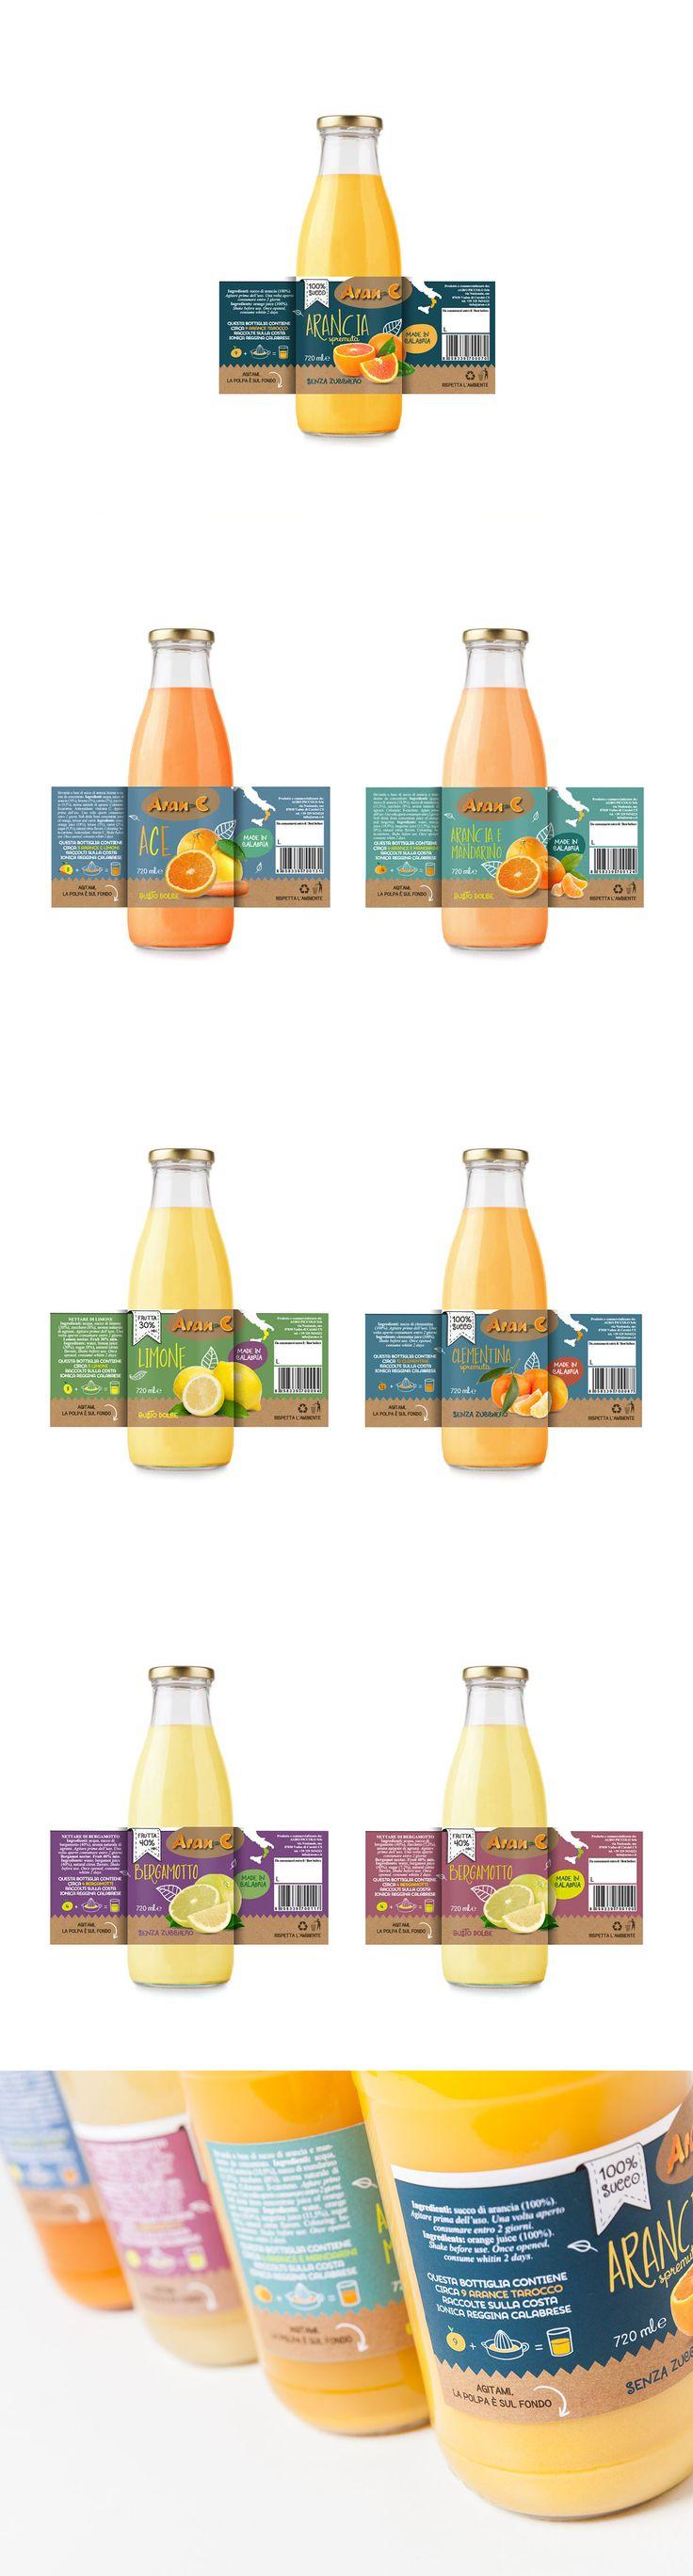 Packaging - citrus juices